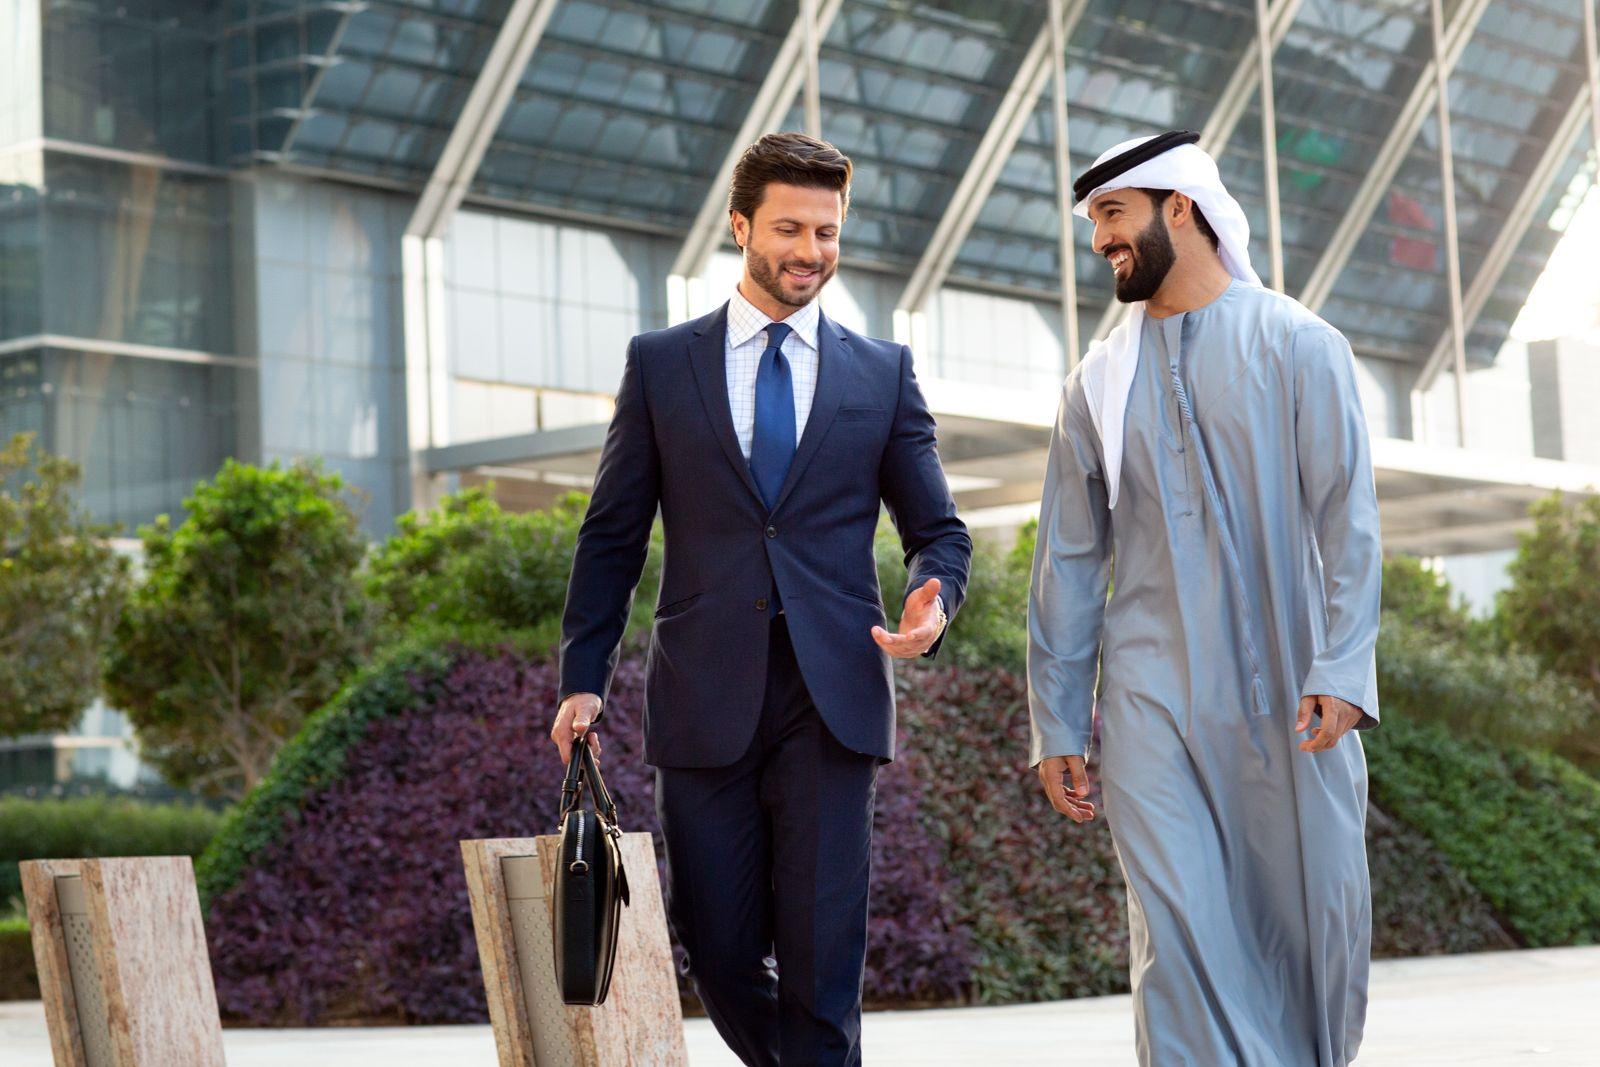 Abu Dhabi Lifestyle Photographer, Dubai Lifestyle Photographer, Saudi Arabia Advertising Photographer, Saudi Arabia Lifestyle Photographer-0262.jpg